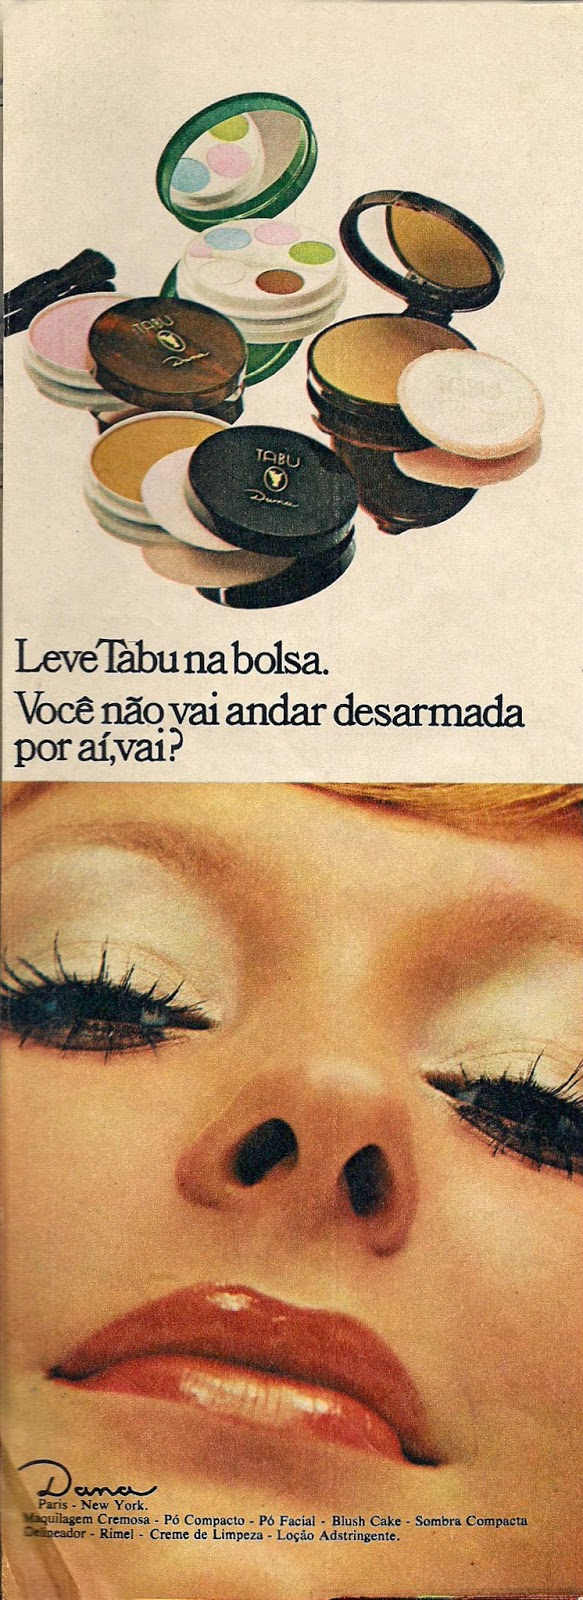 moda anos 70. os anos 70; propaganda na década de 70; Brazil in the 70s, história anos 70; Oswaldo Hernandez;